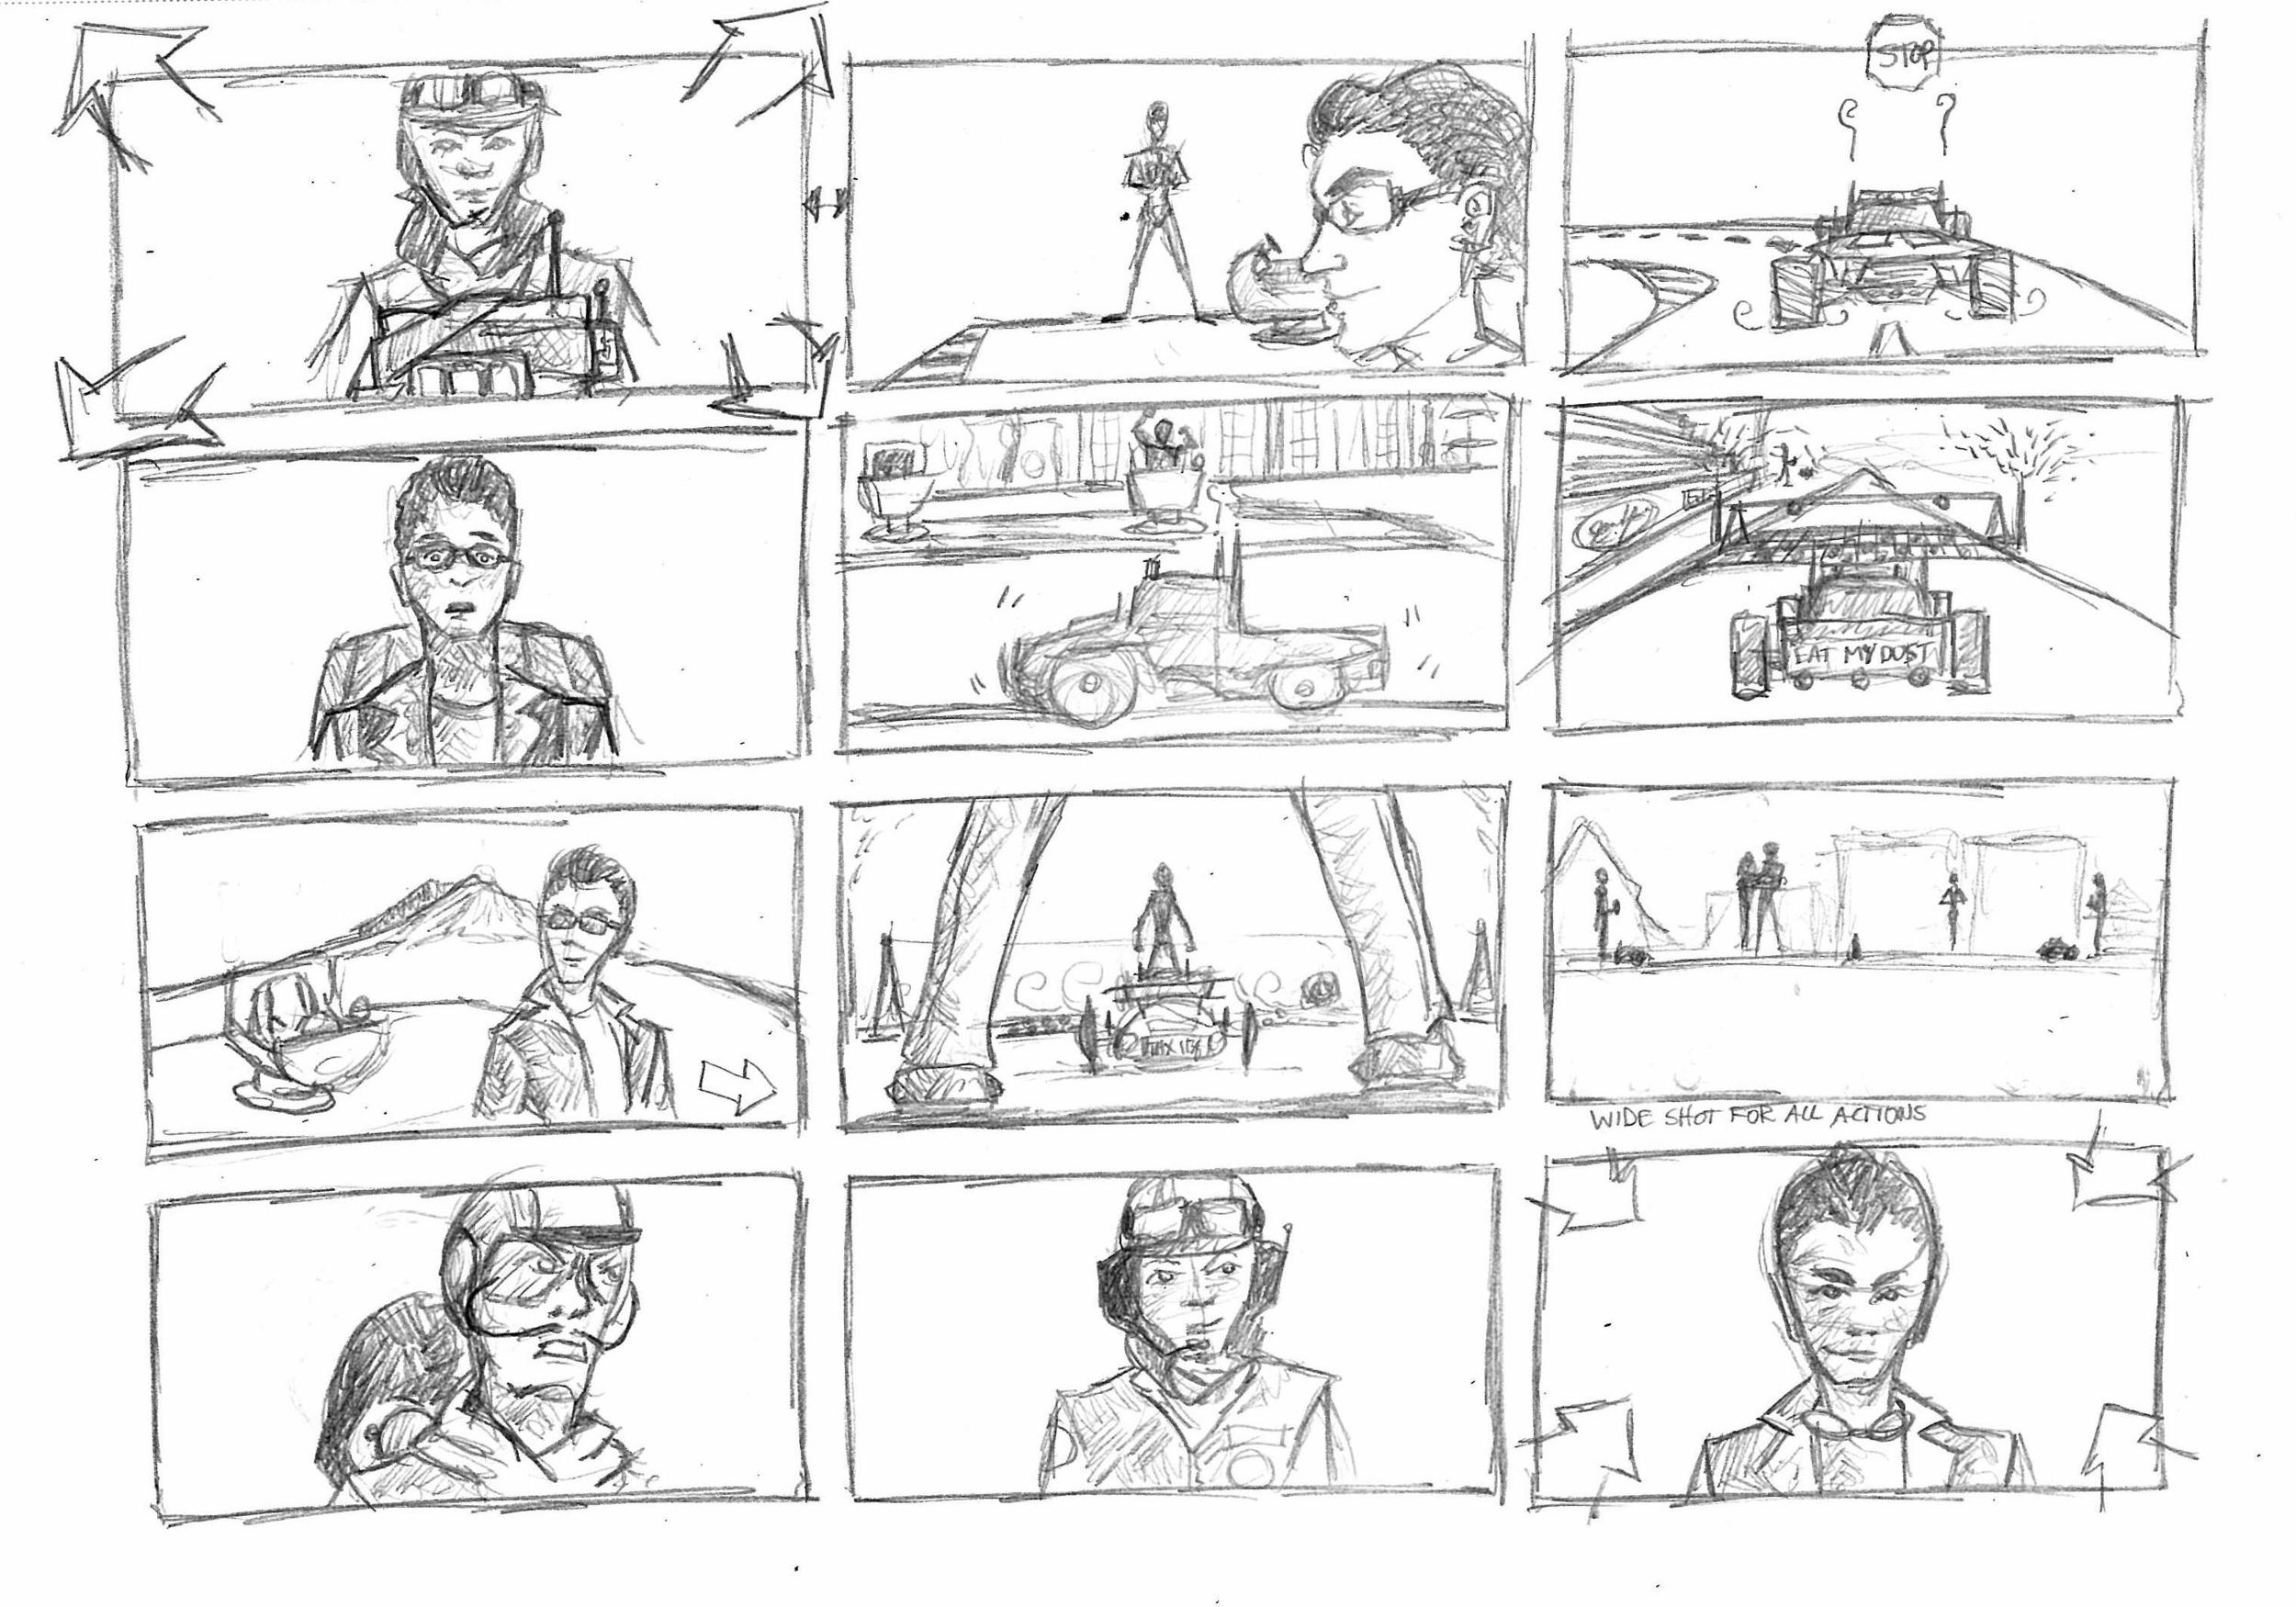 Prix Storyboard_PG015 - Film and TV - Jonathan B Perez - cREAtive Castle Studios.jpg